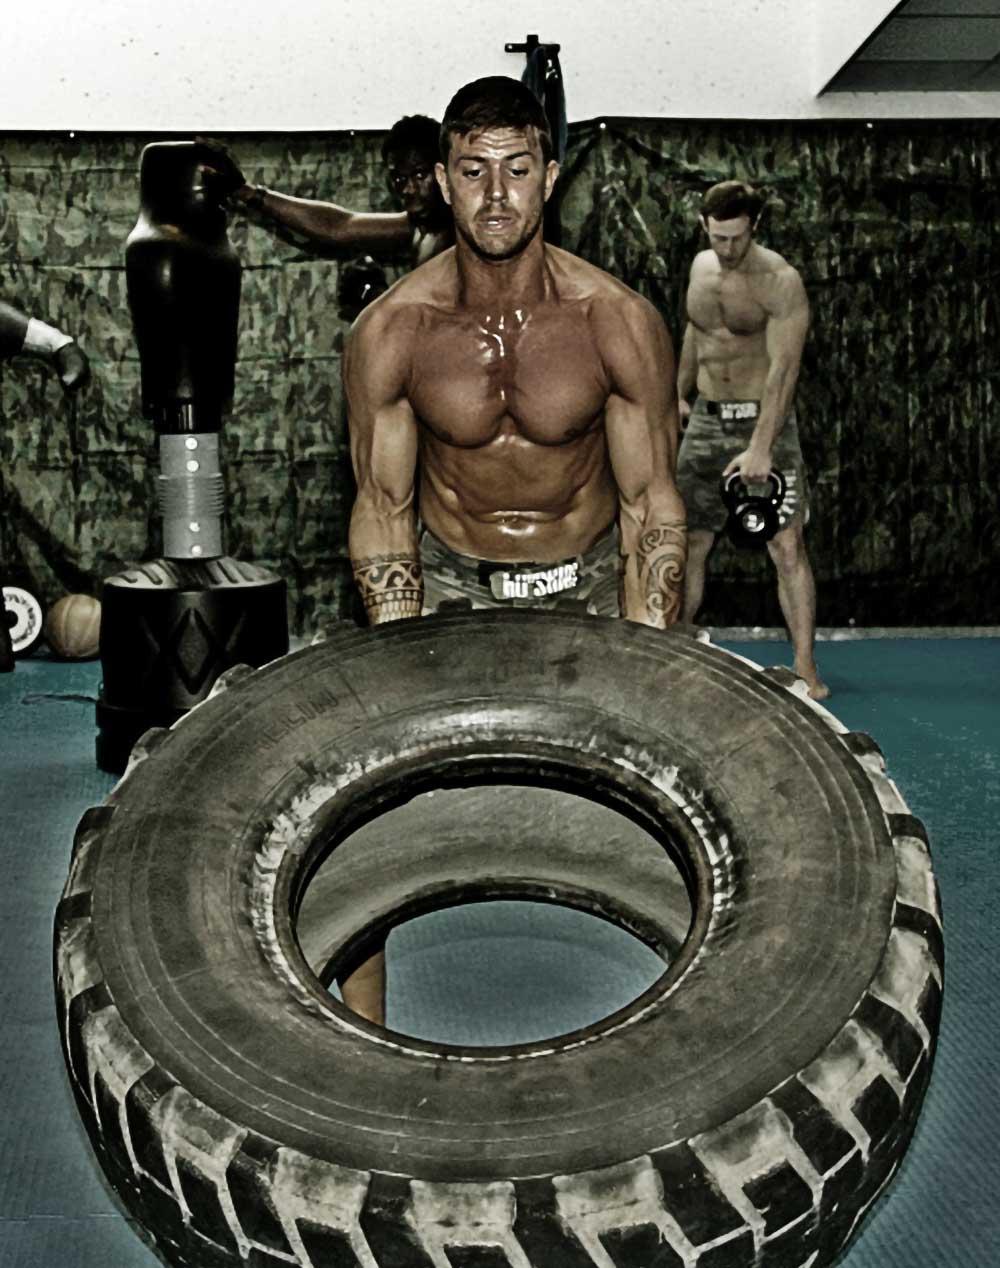 Luca Goffi MMA & Mattia Cigolini Bodybuilding